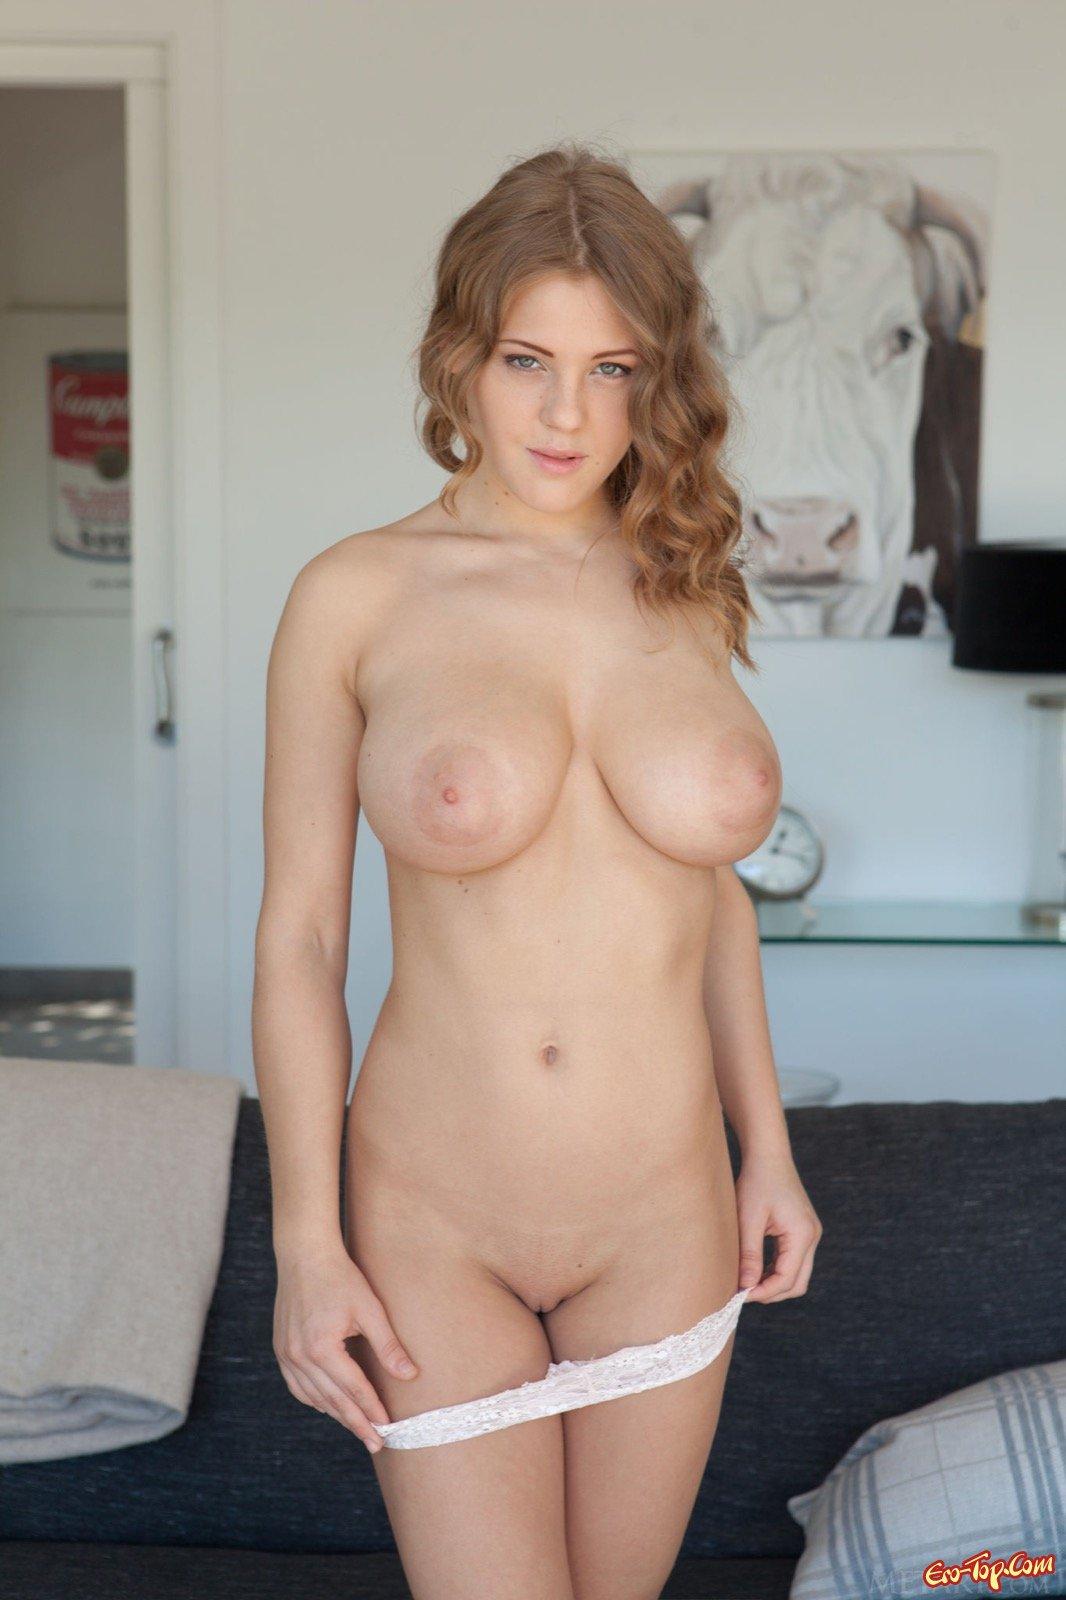 Титястая деваха засвечивает письку для порно журнала секс фото